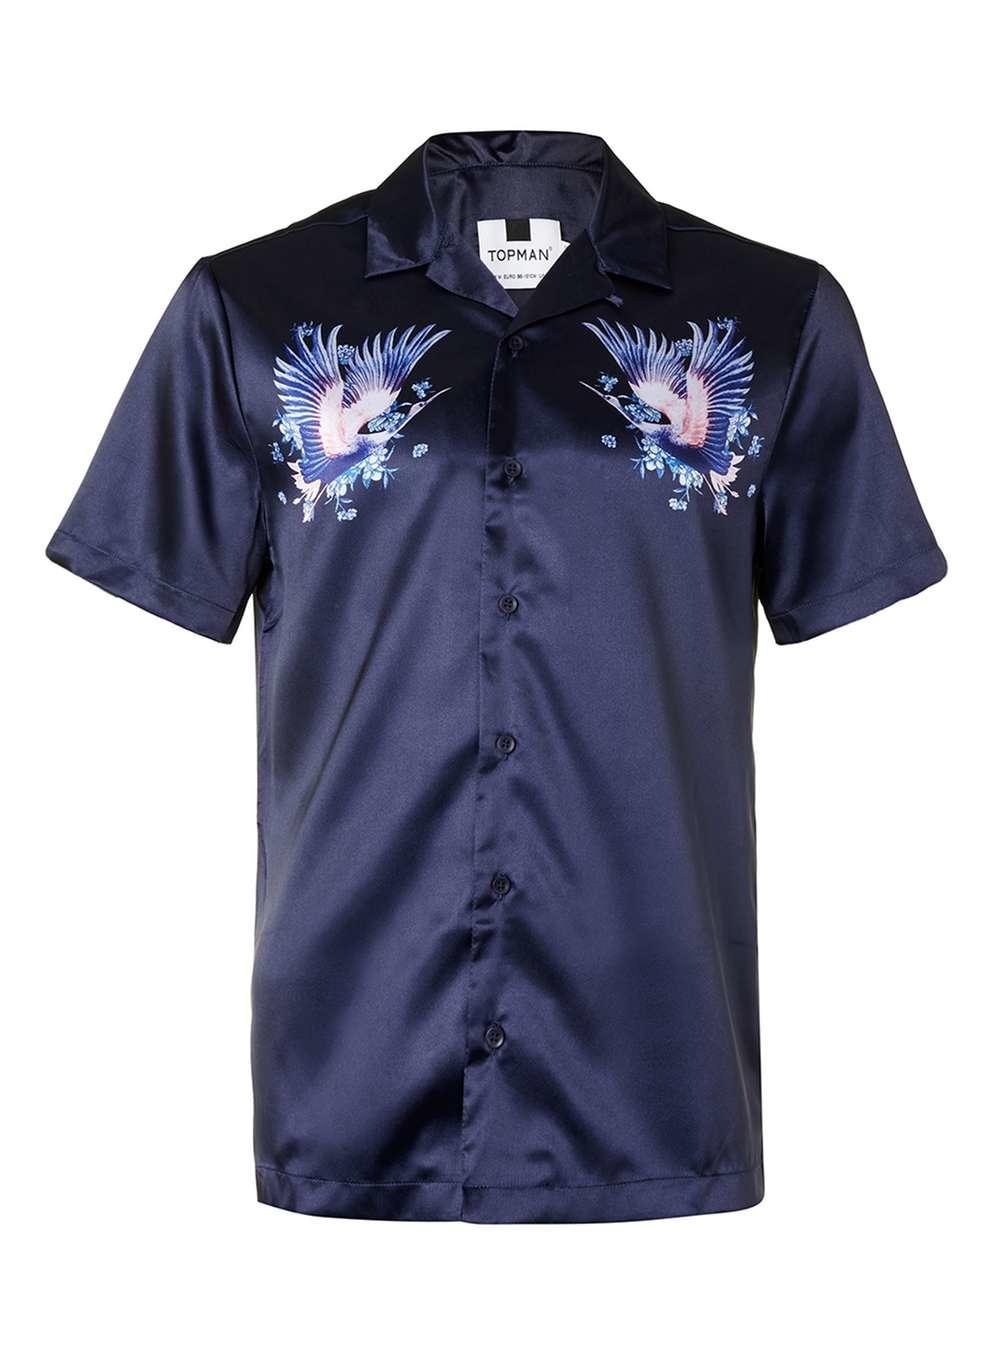 Topman Navy Heron Print Satin Feel Short Sleeve Casual